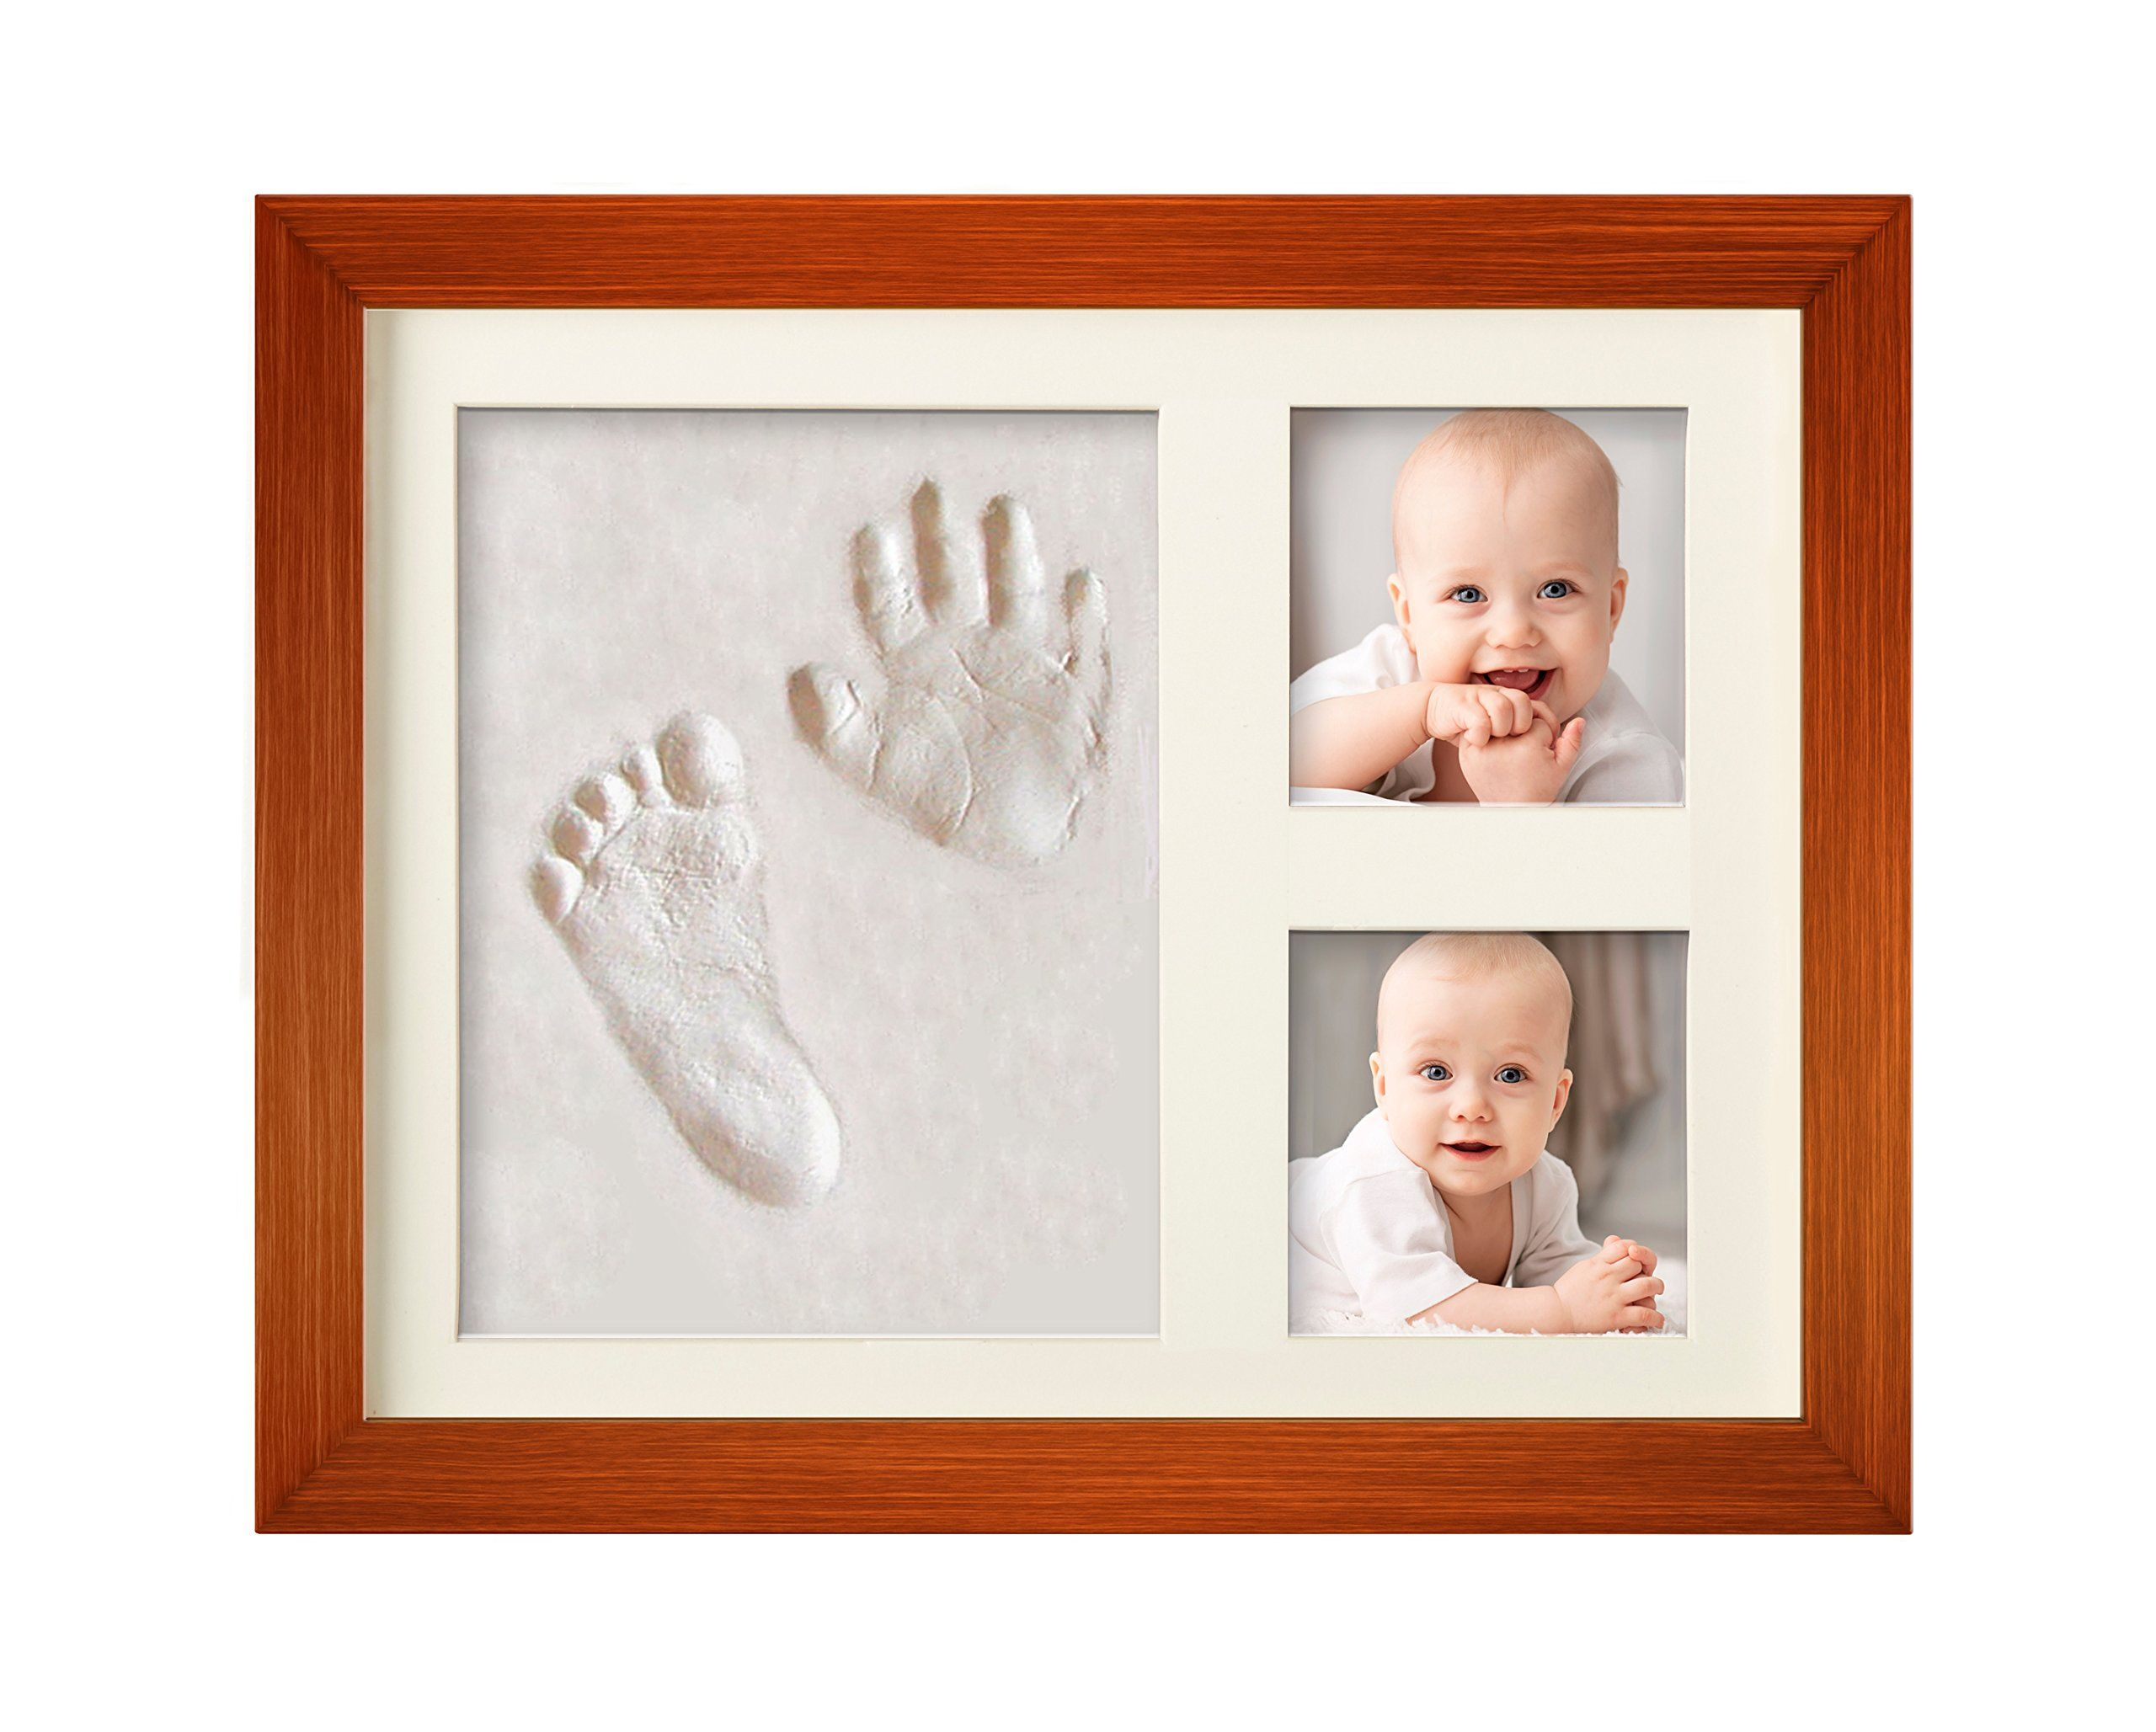 Bubzi co baby clay handprint footprint photo frame kit for newborn girls and boys